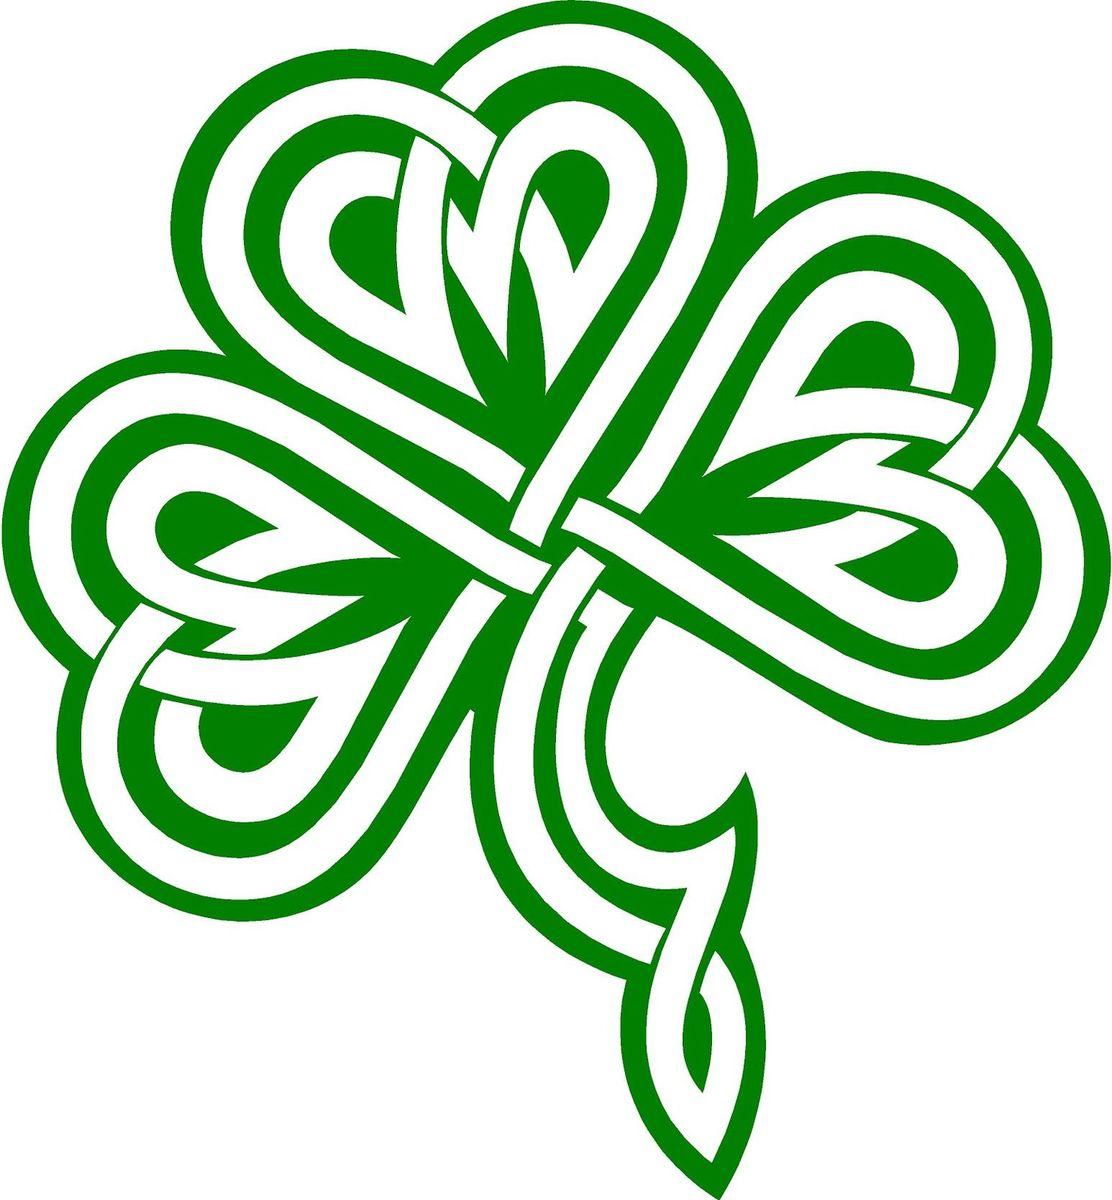 Celt clipart shamrock Color knot Clipart Shamrock clipart